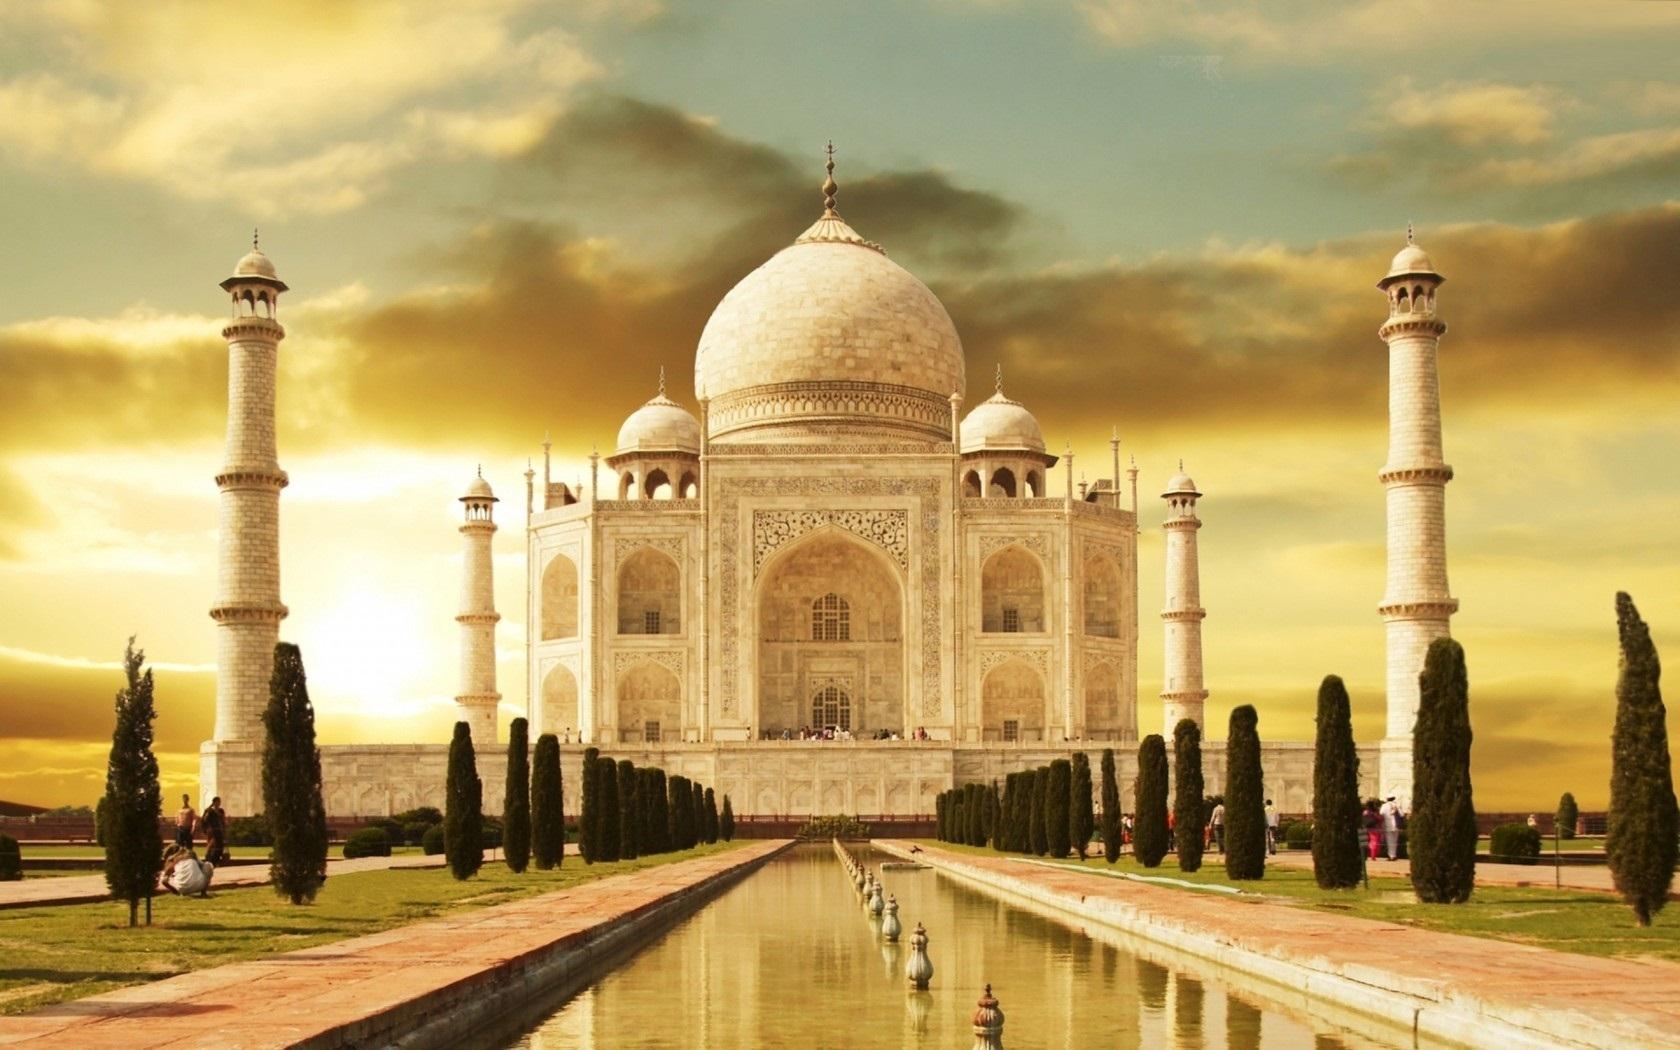 Taj Mahal not a temple but a tomb, ASI tells court